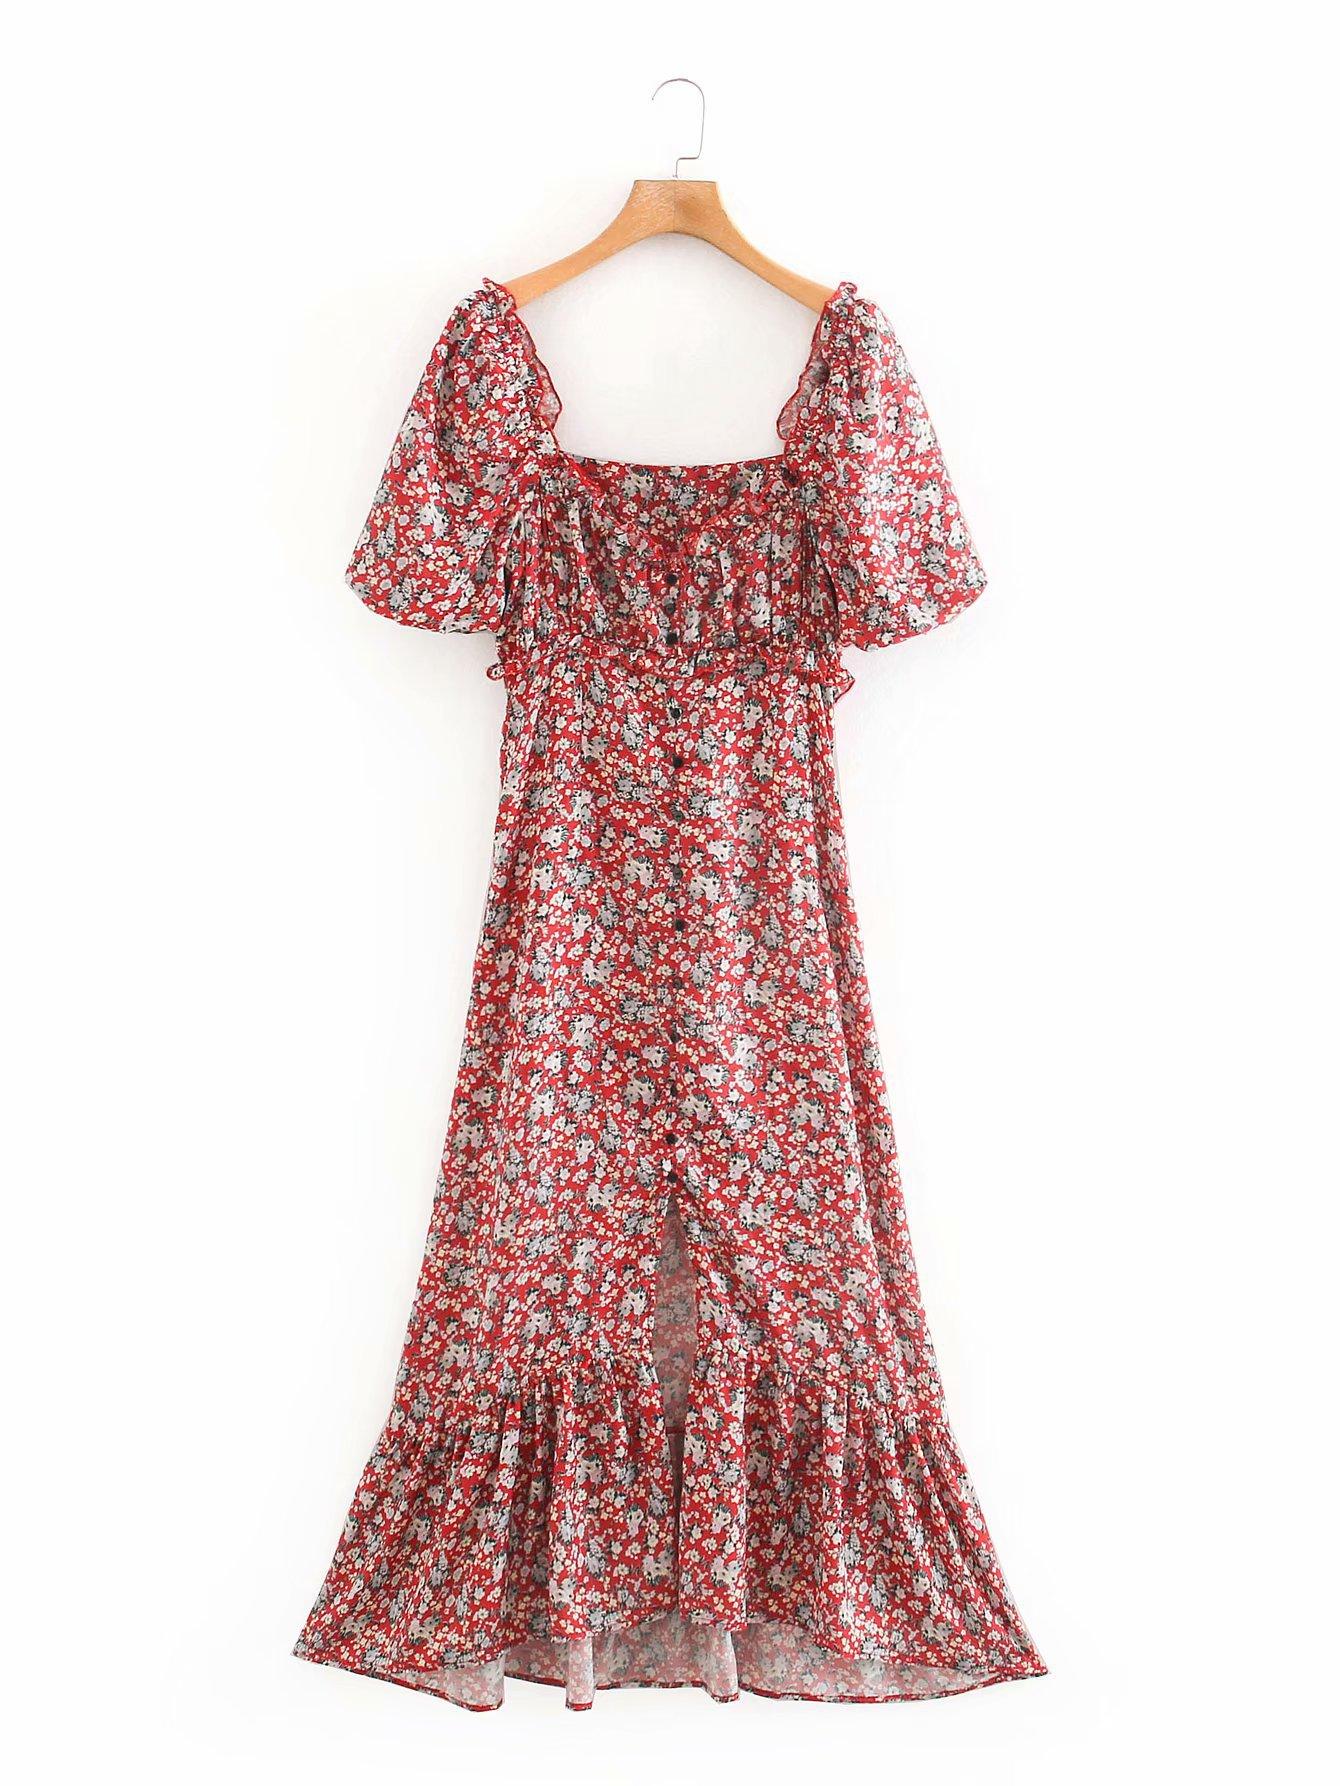 2020 Spring Summer New European Satin Print Red Green Zaraing Women Dress Vadiming Sheining Female Dress Vintage Plus XDN9451